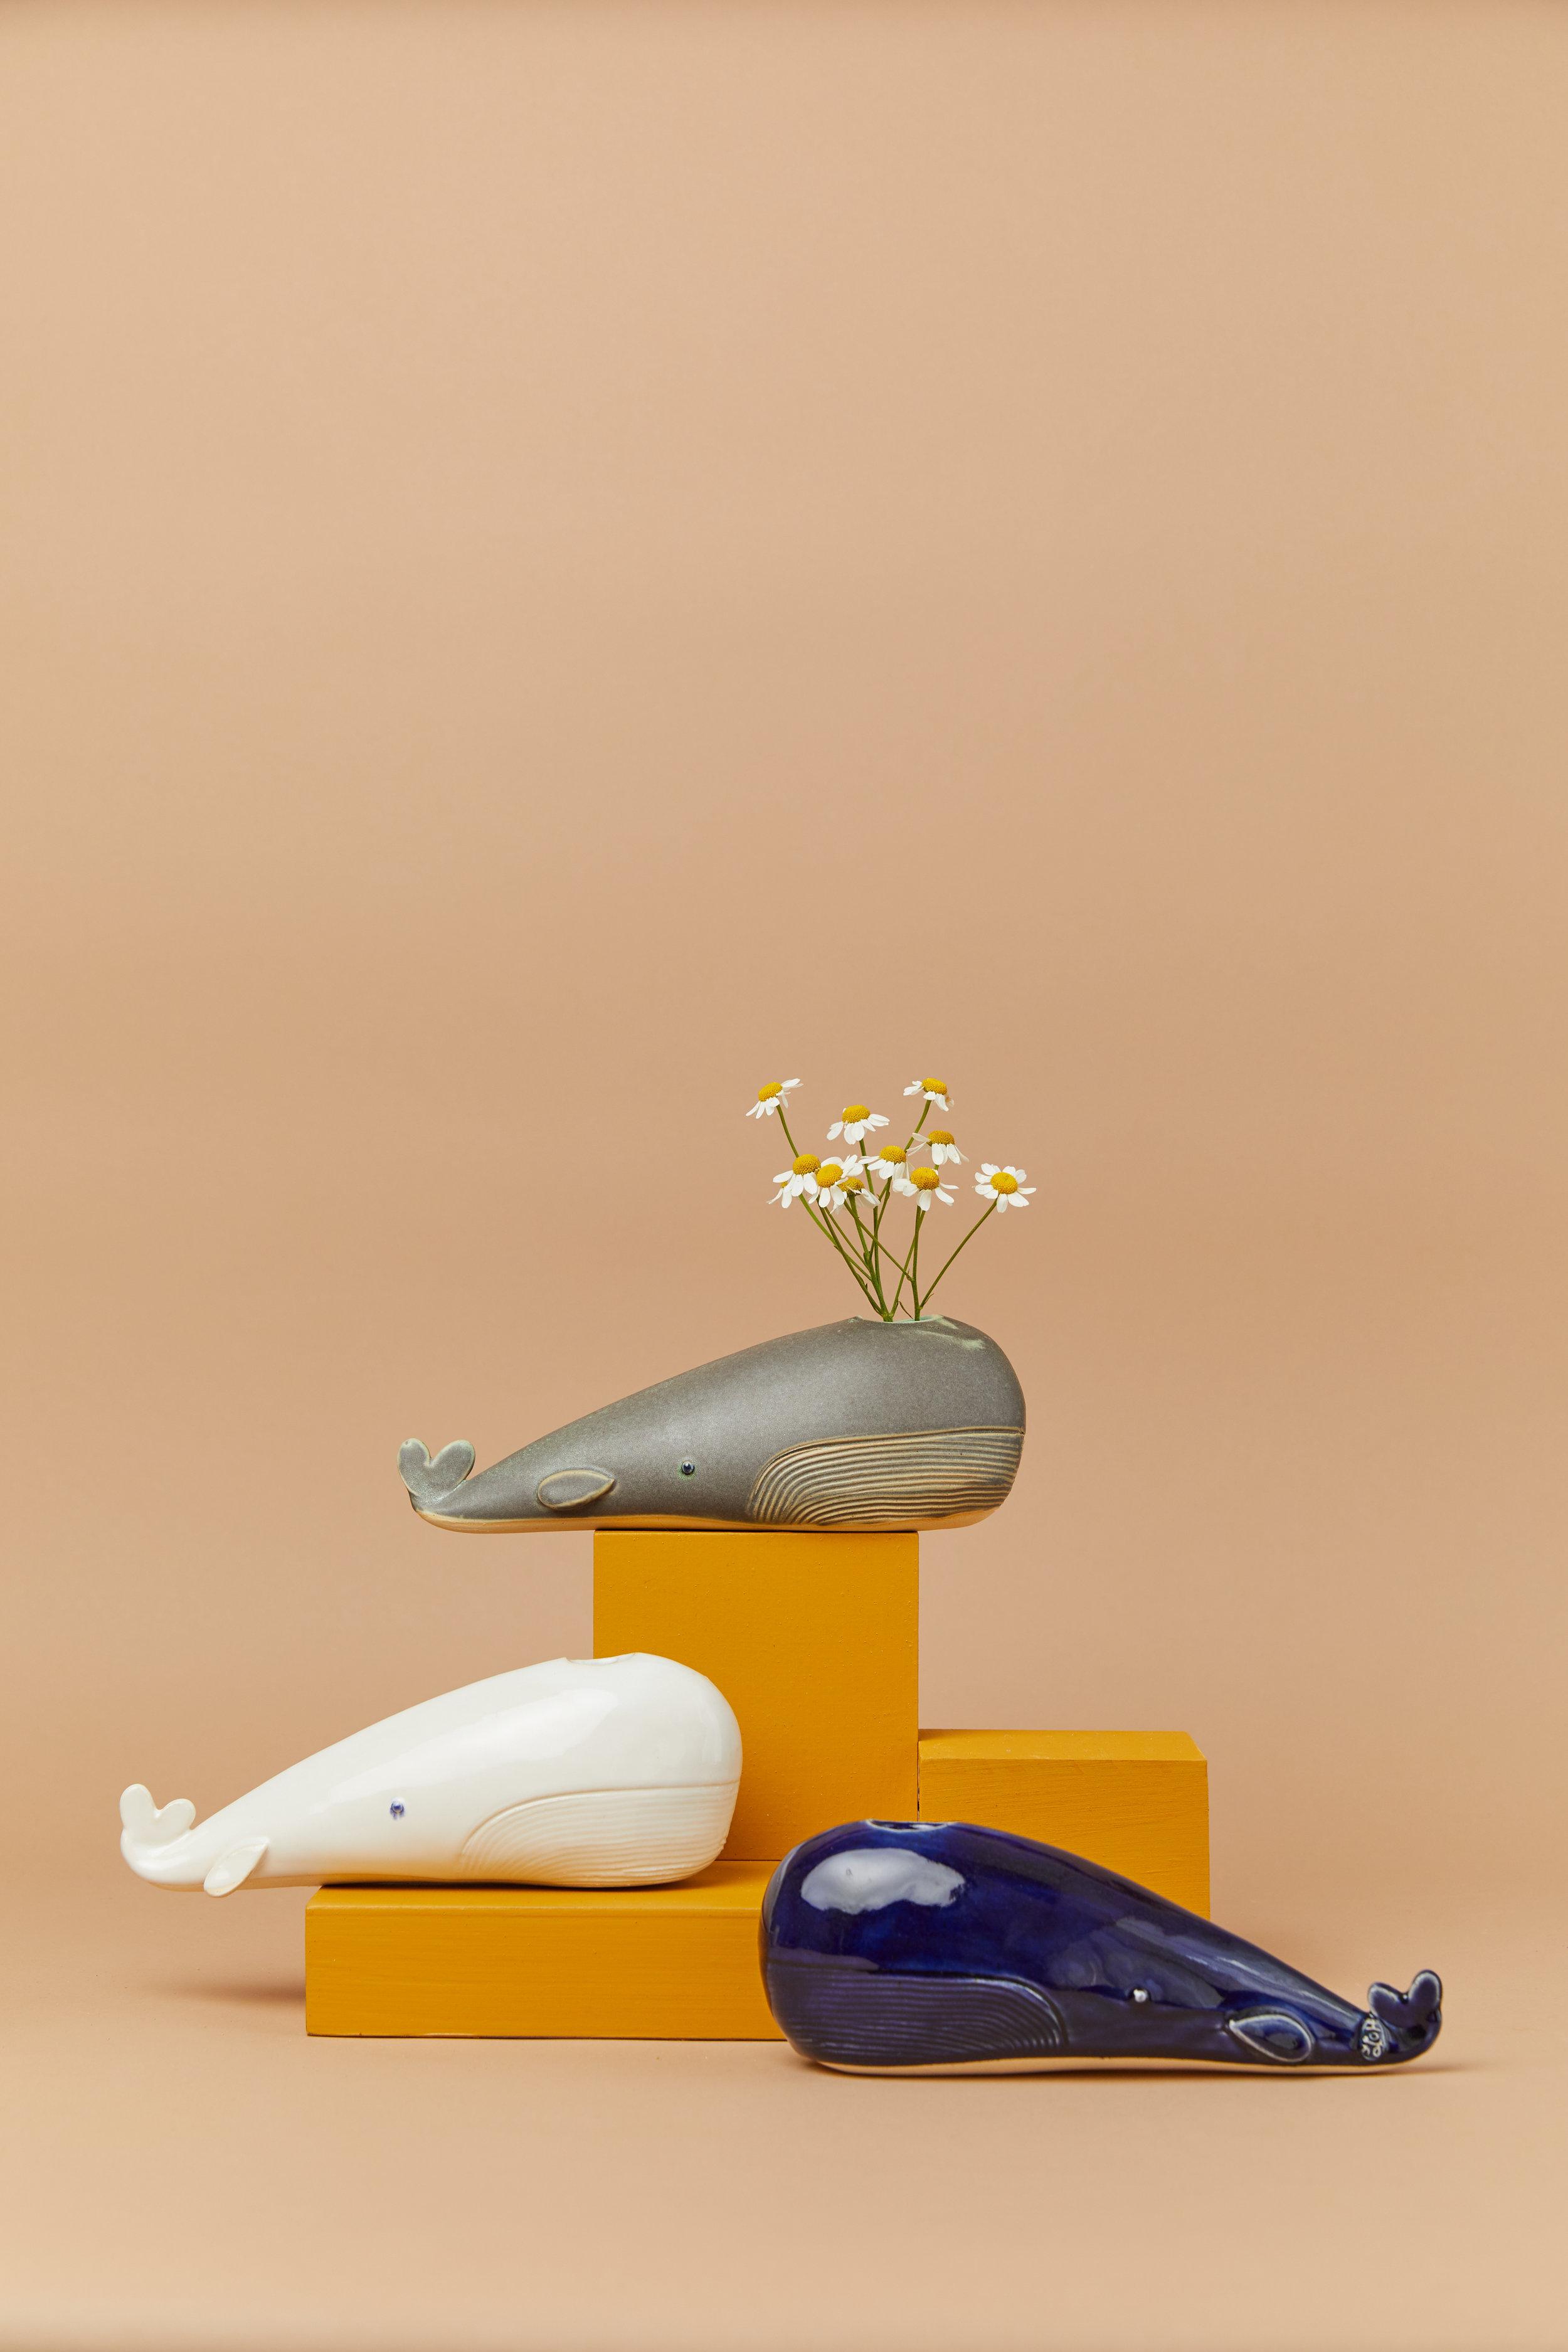 Wale vase by Studio Giverny